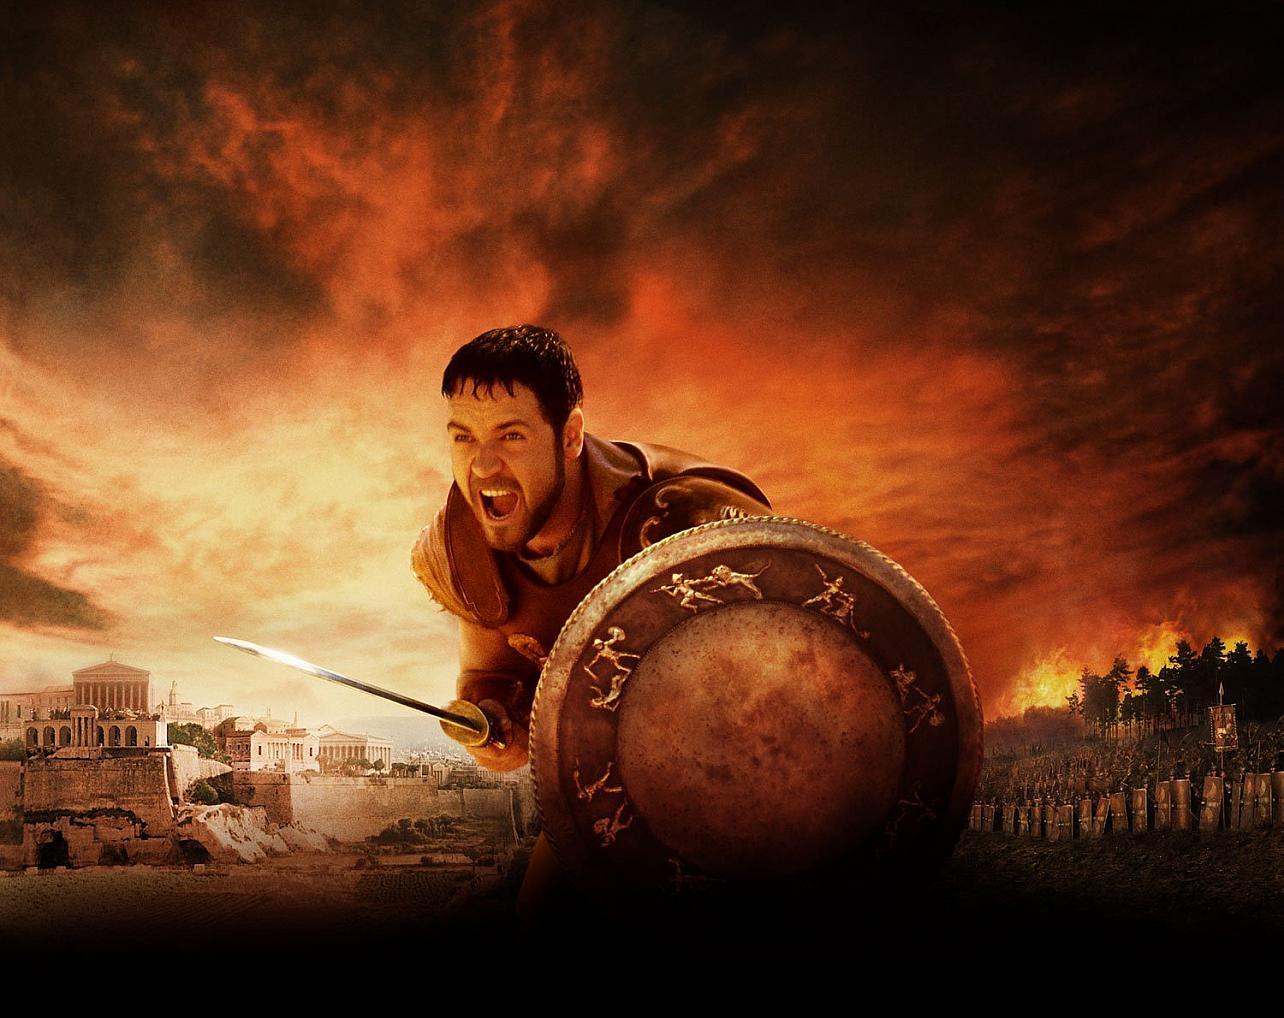 http://2.bp.blogspot.com/_OcSiZJjXT8Y/TPAIzuvDsWI/AAAAAAAAAmk/DNfLNo1yjeo/s1600/gladiator_2000_1284x1024_315596.jpg